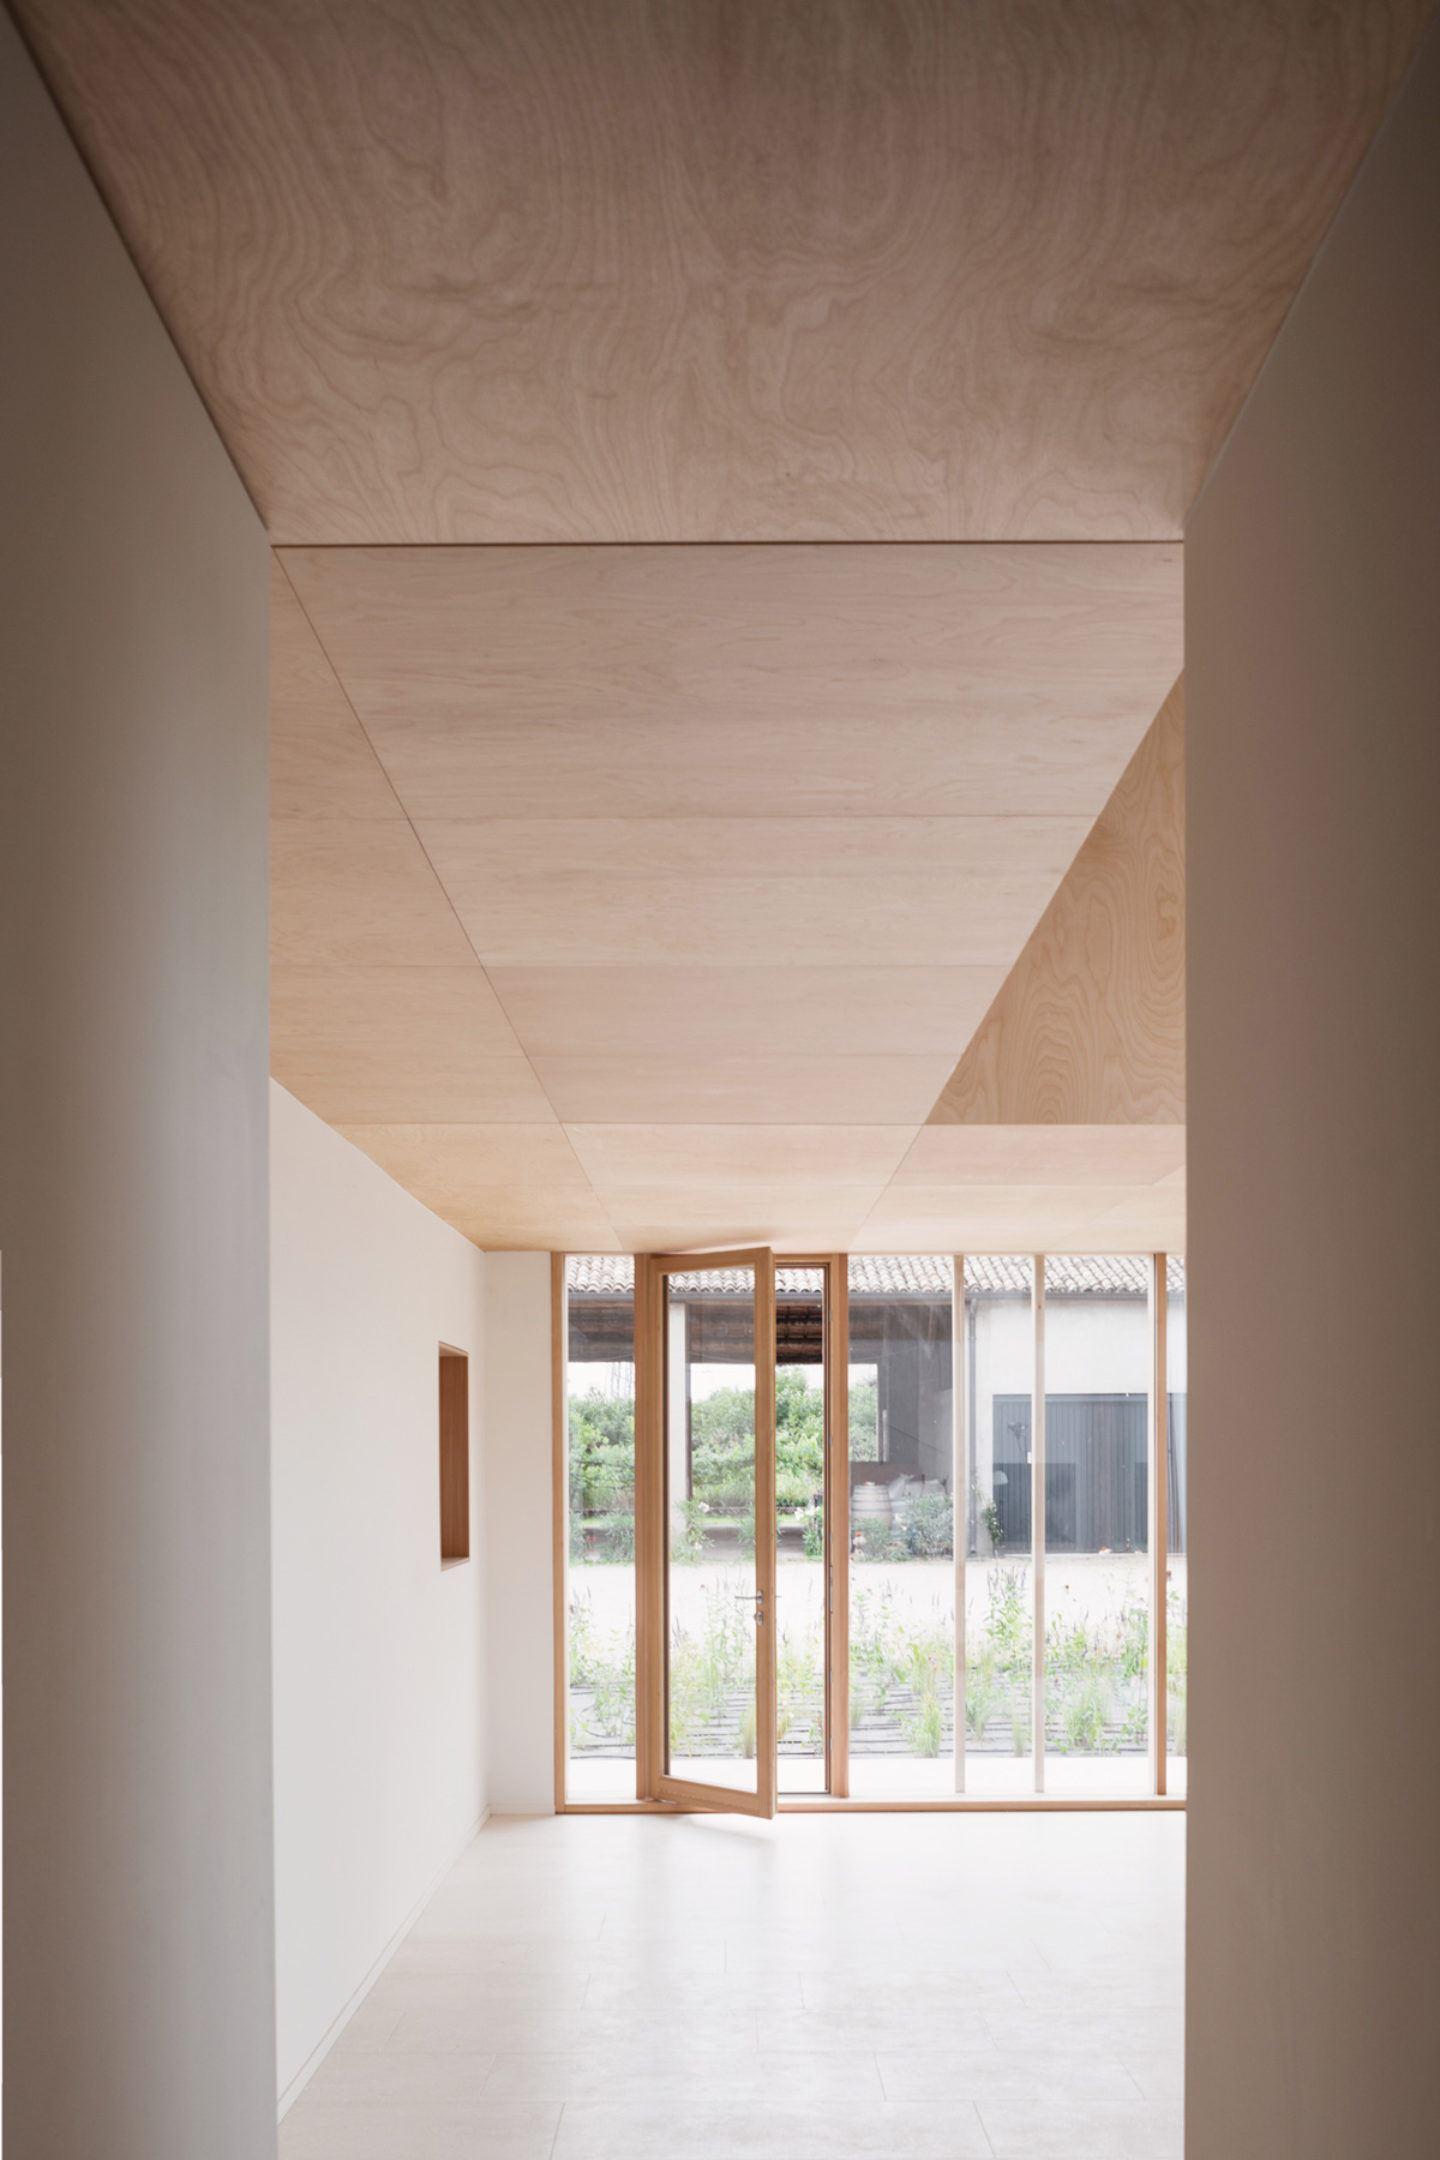 IGNANT-Architecture-Studio-Wok-Country-Home-In-Chievo-12